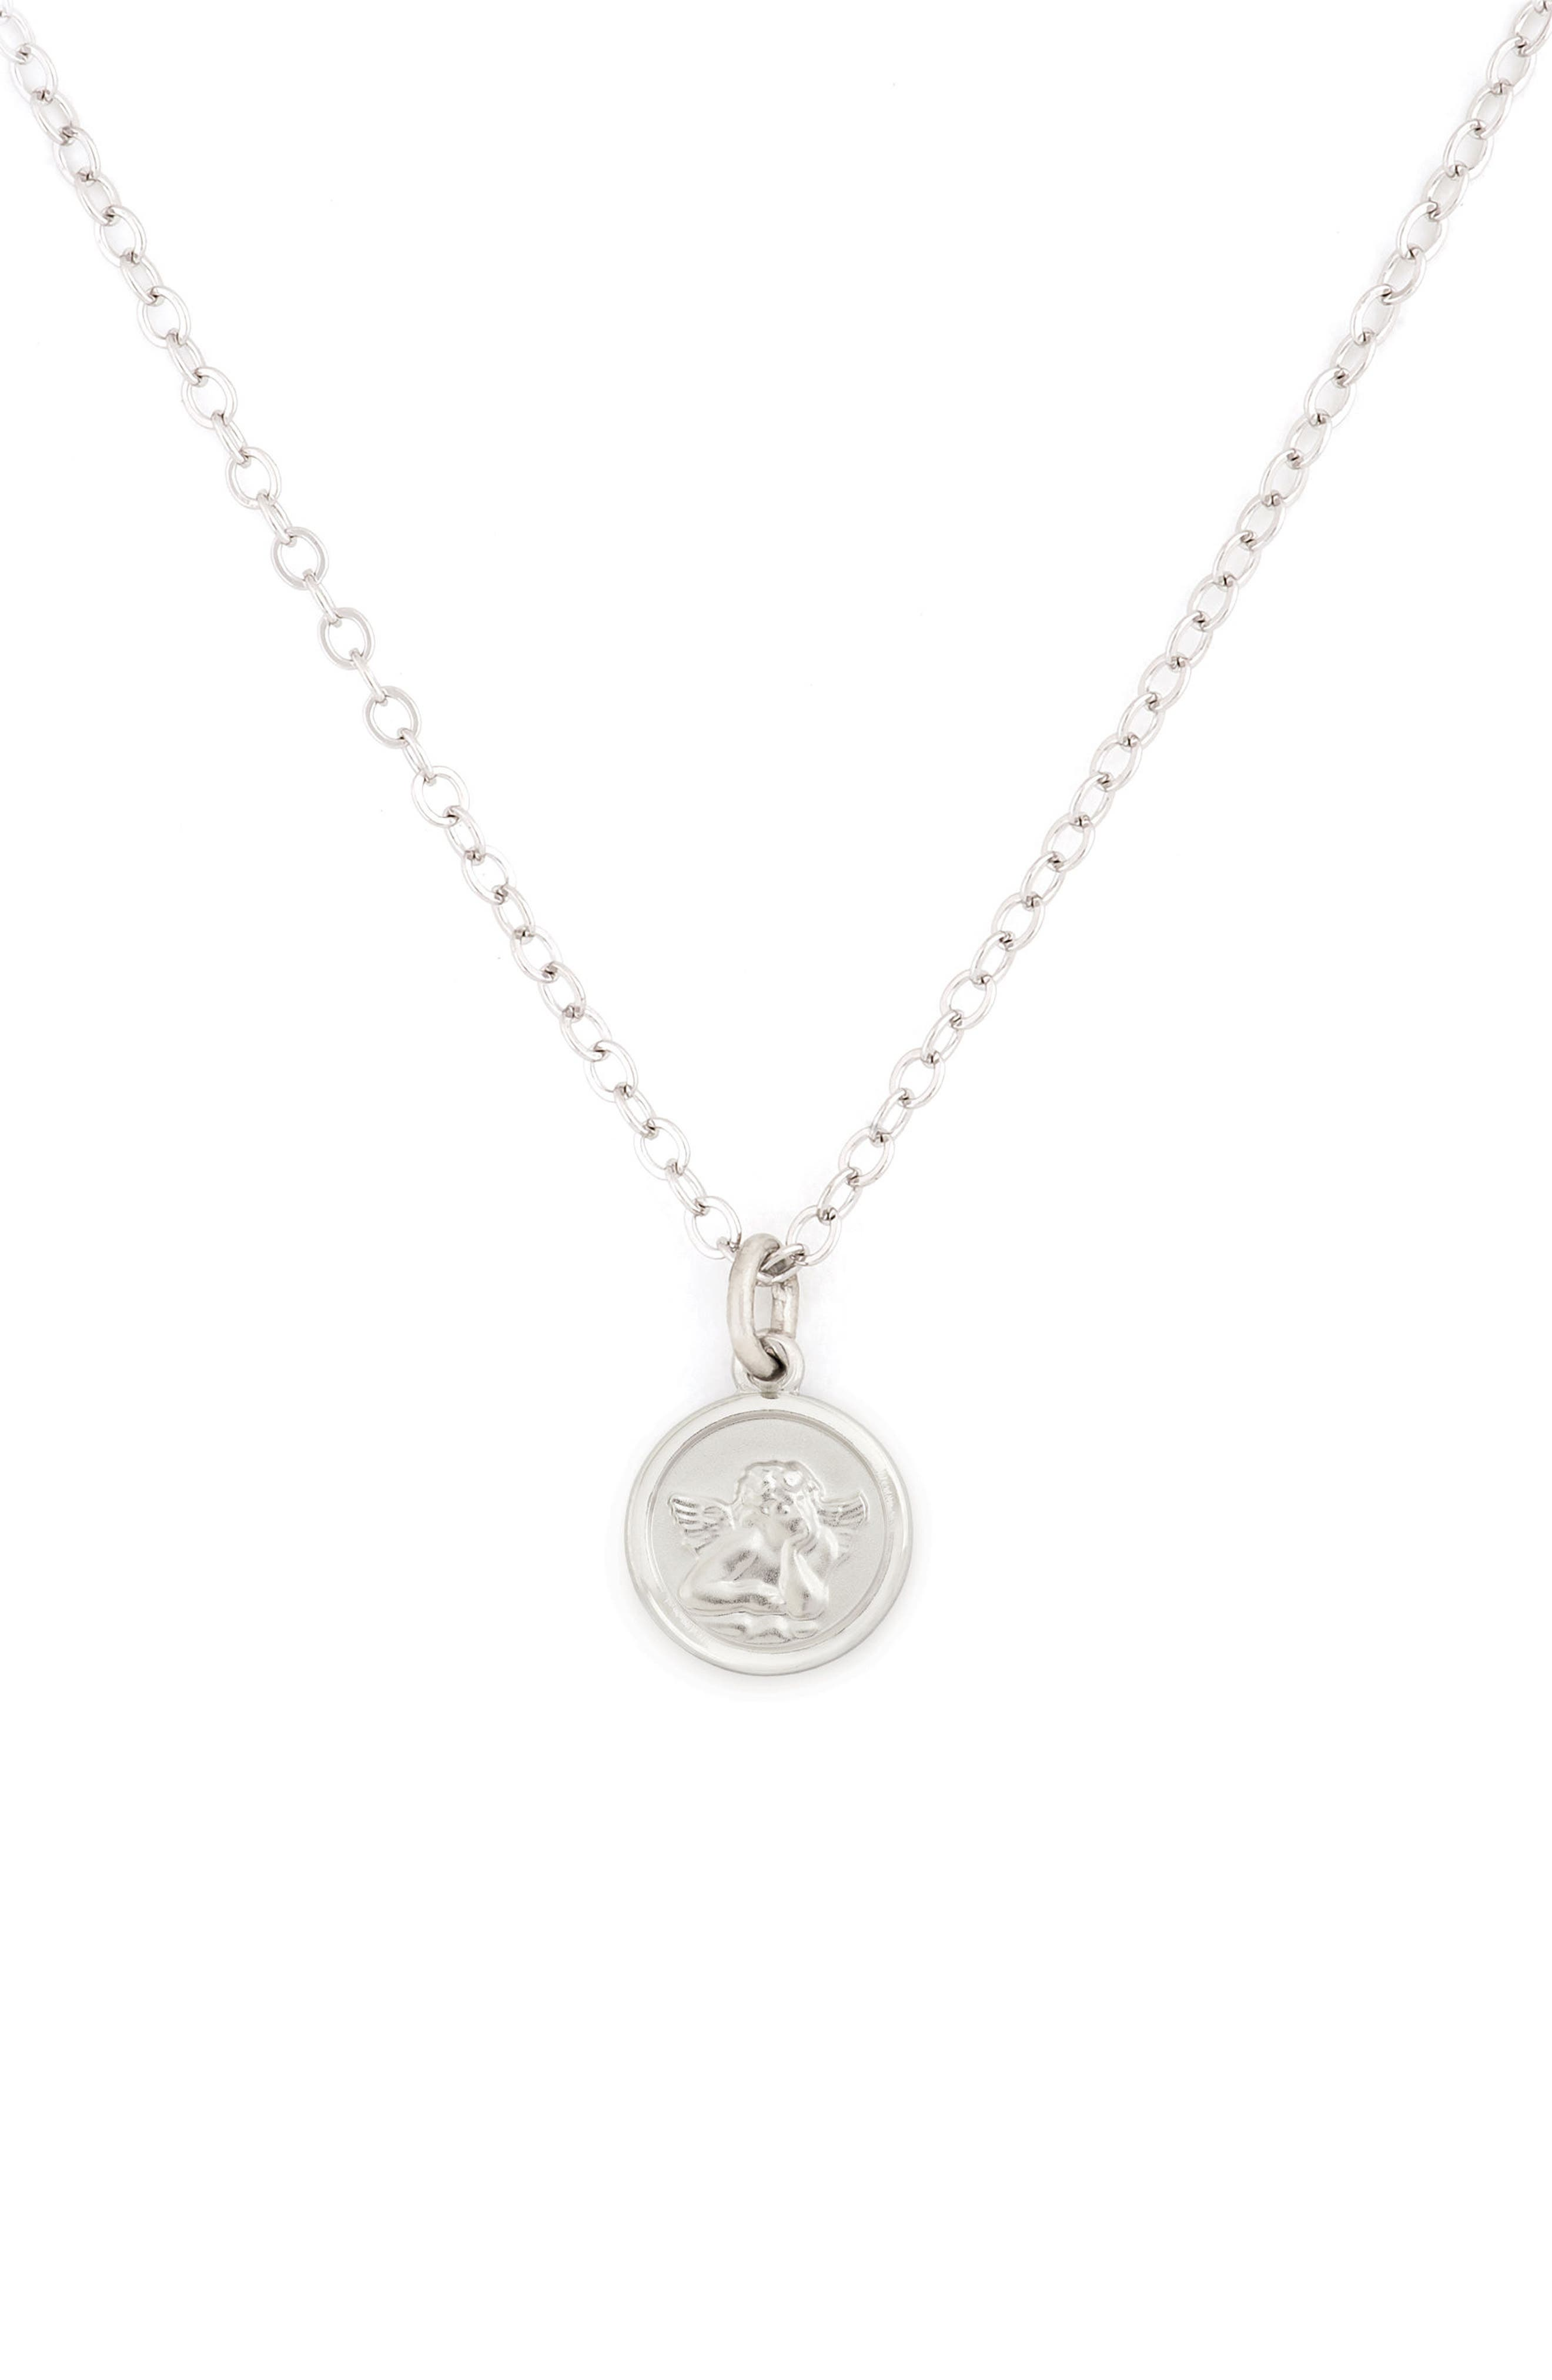 Cherub Medal Sterling Silver Pendant Necklace,                         Main,                         color, Silver